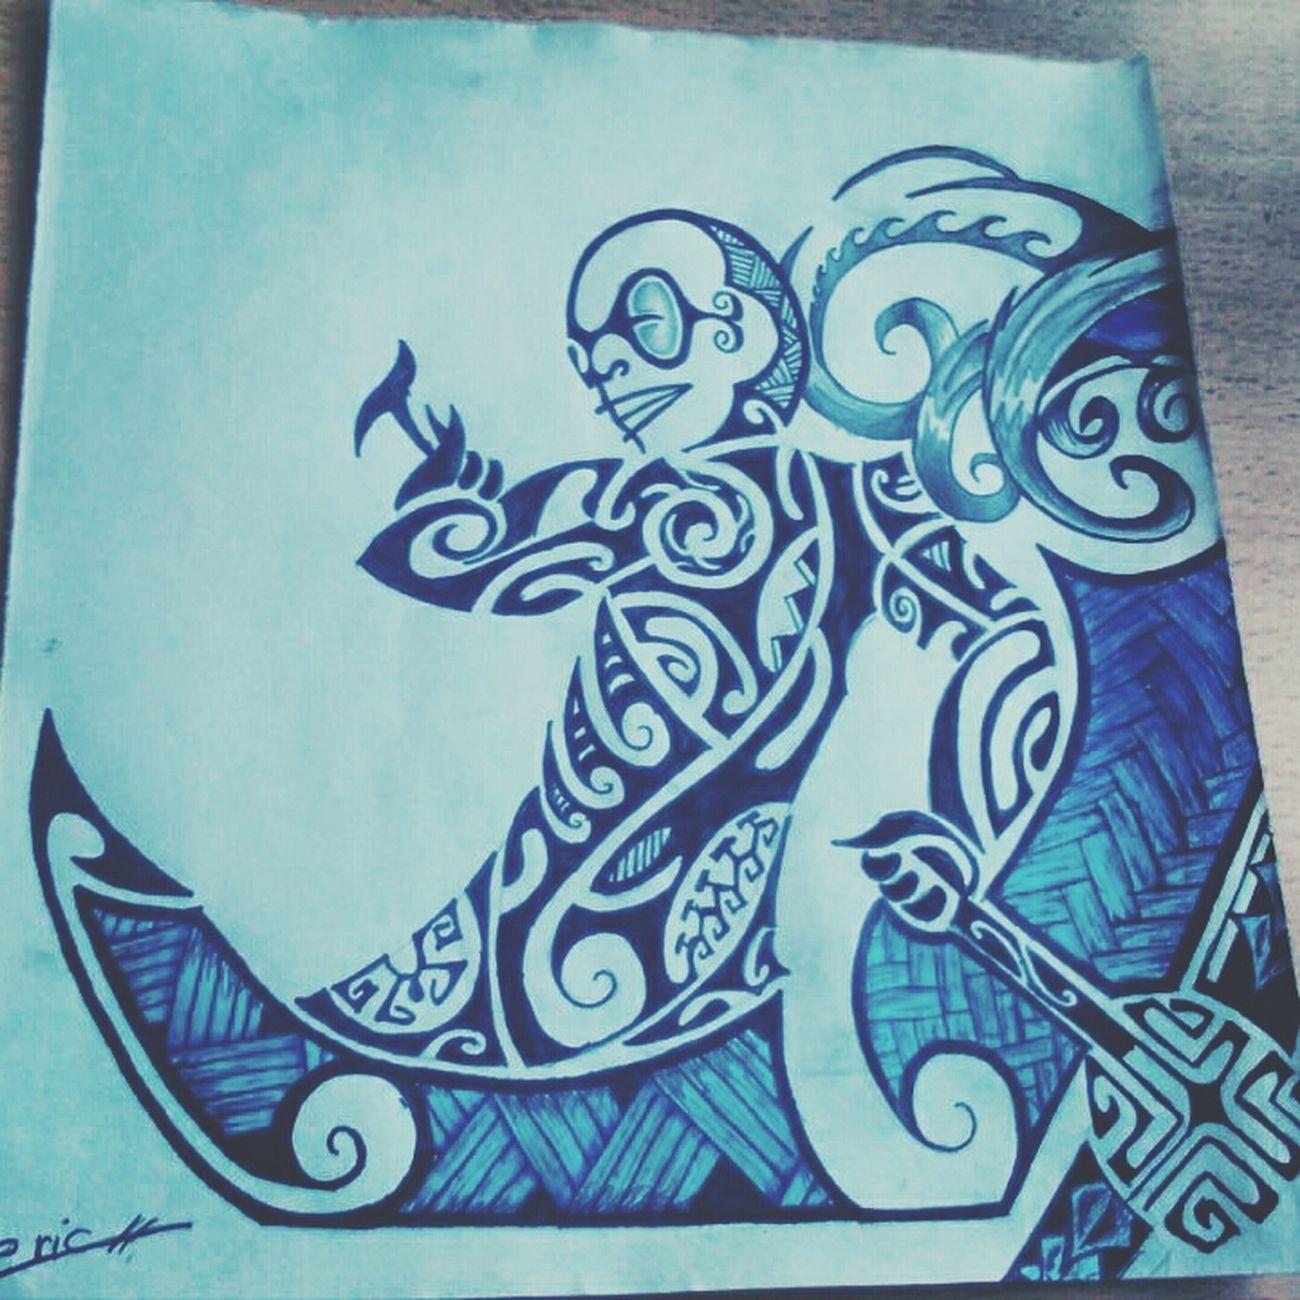 Maorie. Tattoo Maorie Ric